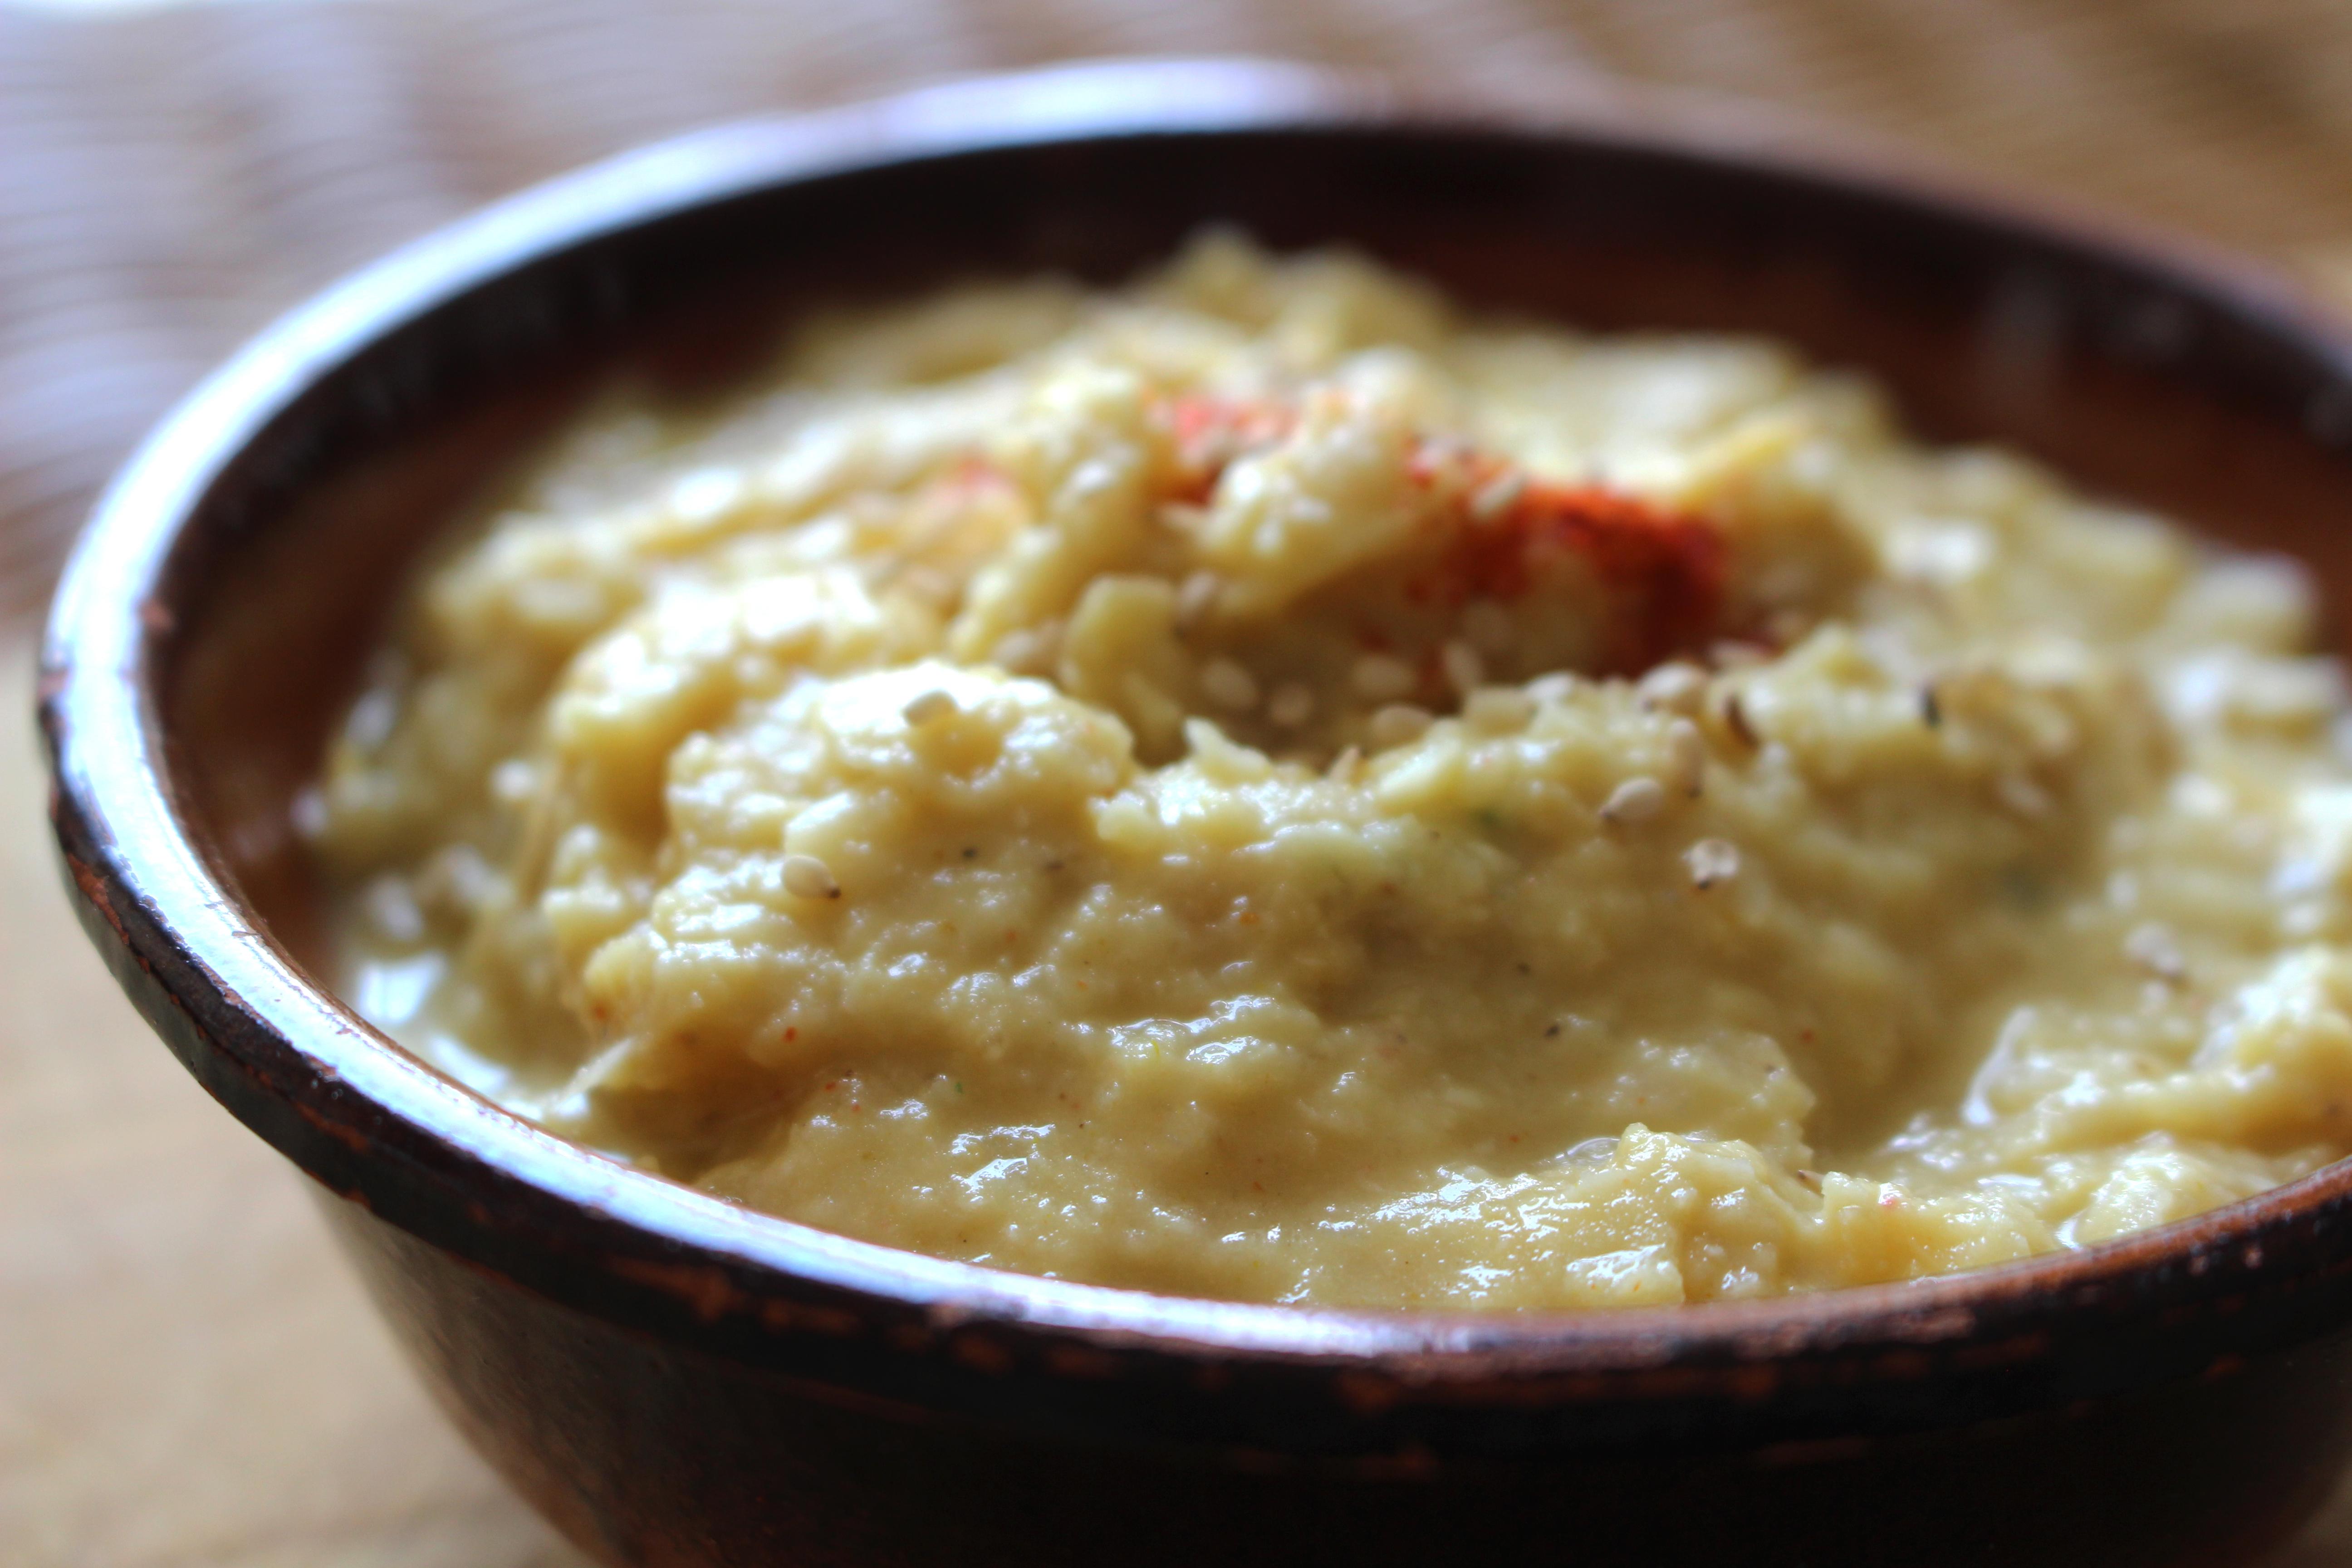 Hummus Ricetta Semplice Senza Tahina.Ricetta Hummus Di Ceci Senza Tahina Miss Foodie